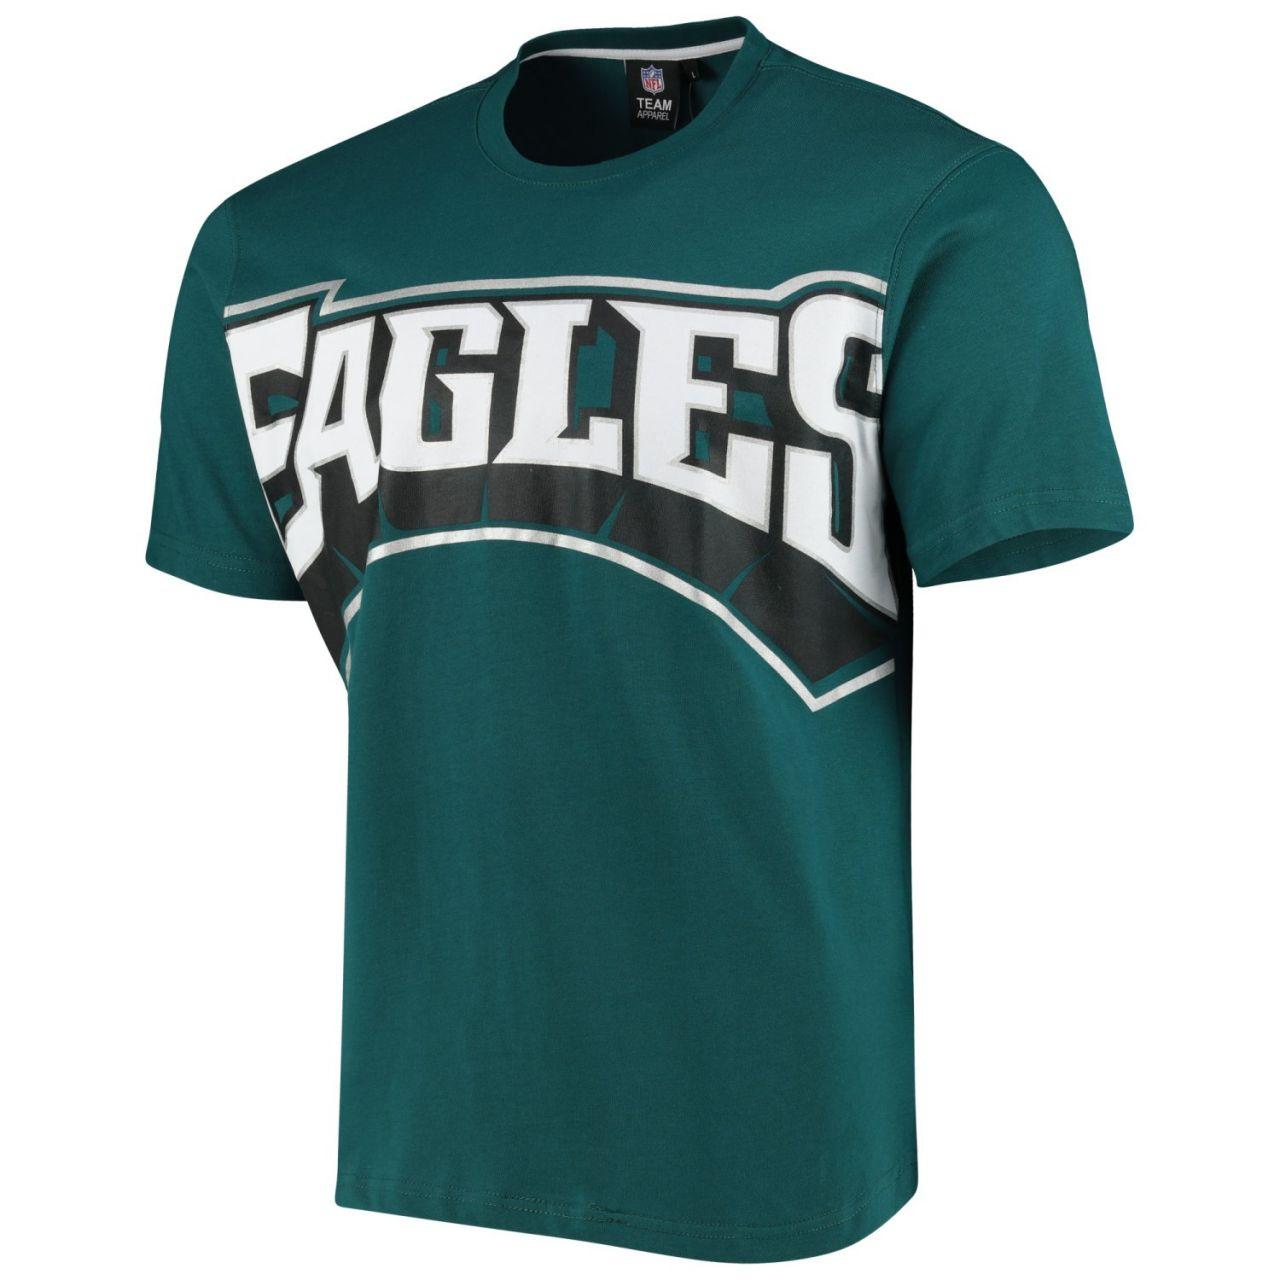 amfoo - Philadelphia Eagles BIG GRAPHIC NFL Shirt teal